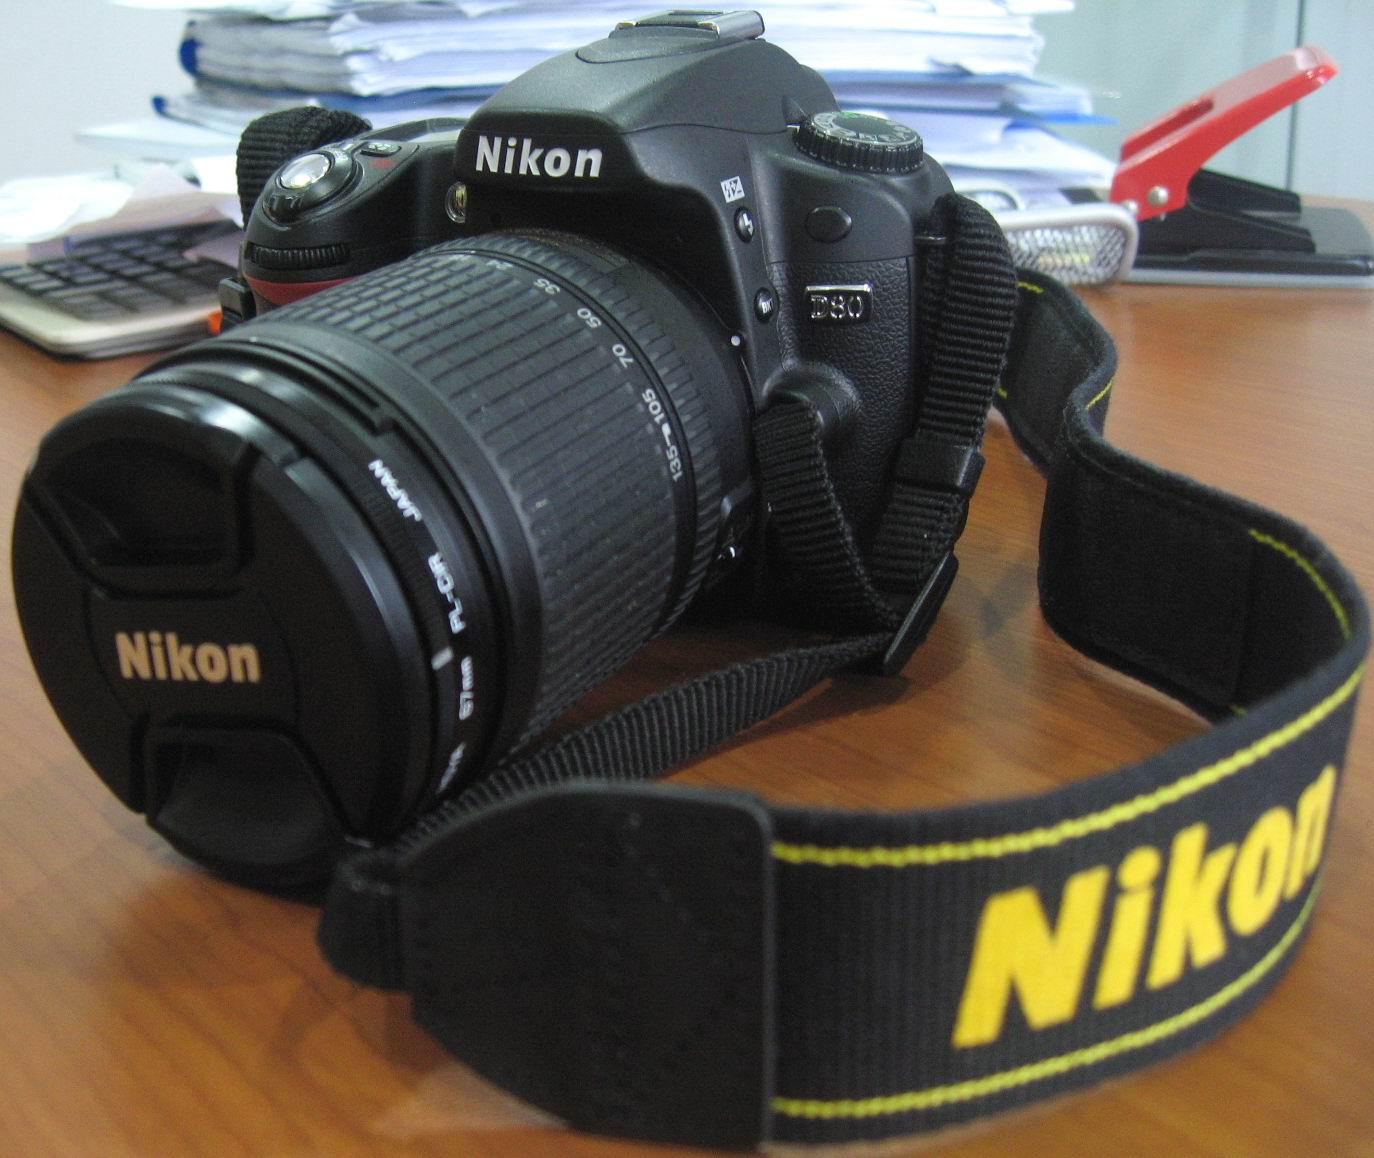 File:Nikon D80 side.jp...